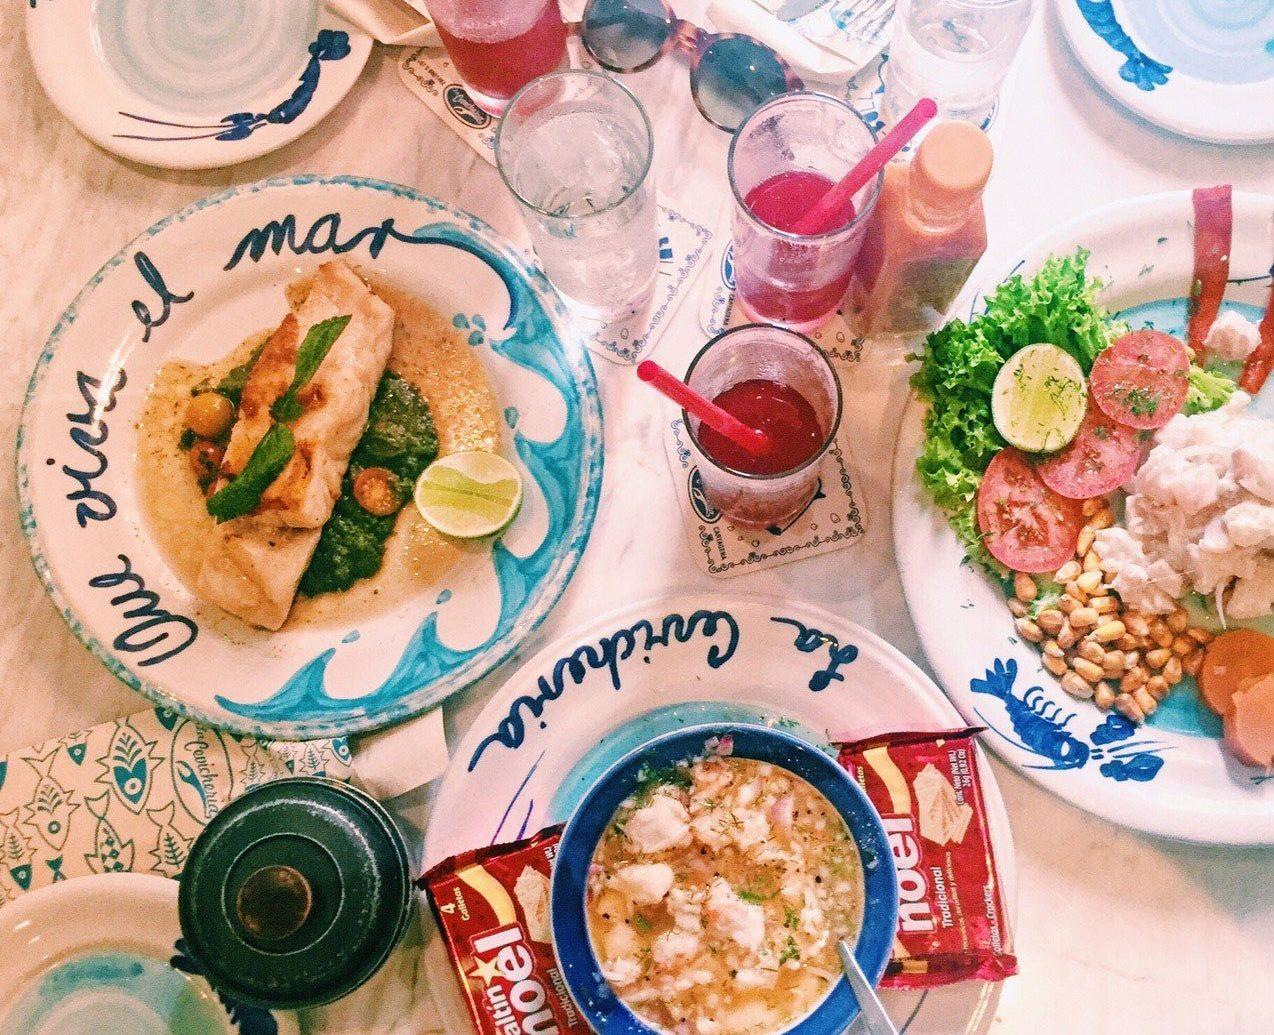 Jetsetter Guides dish meal lunch food breakfast sense brunch cuisine several